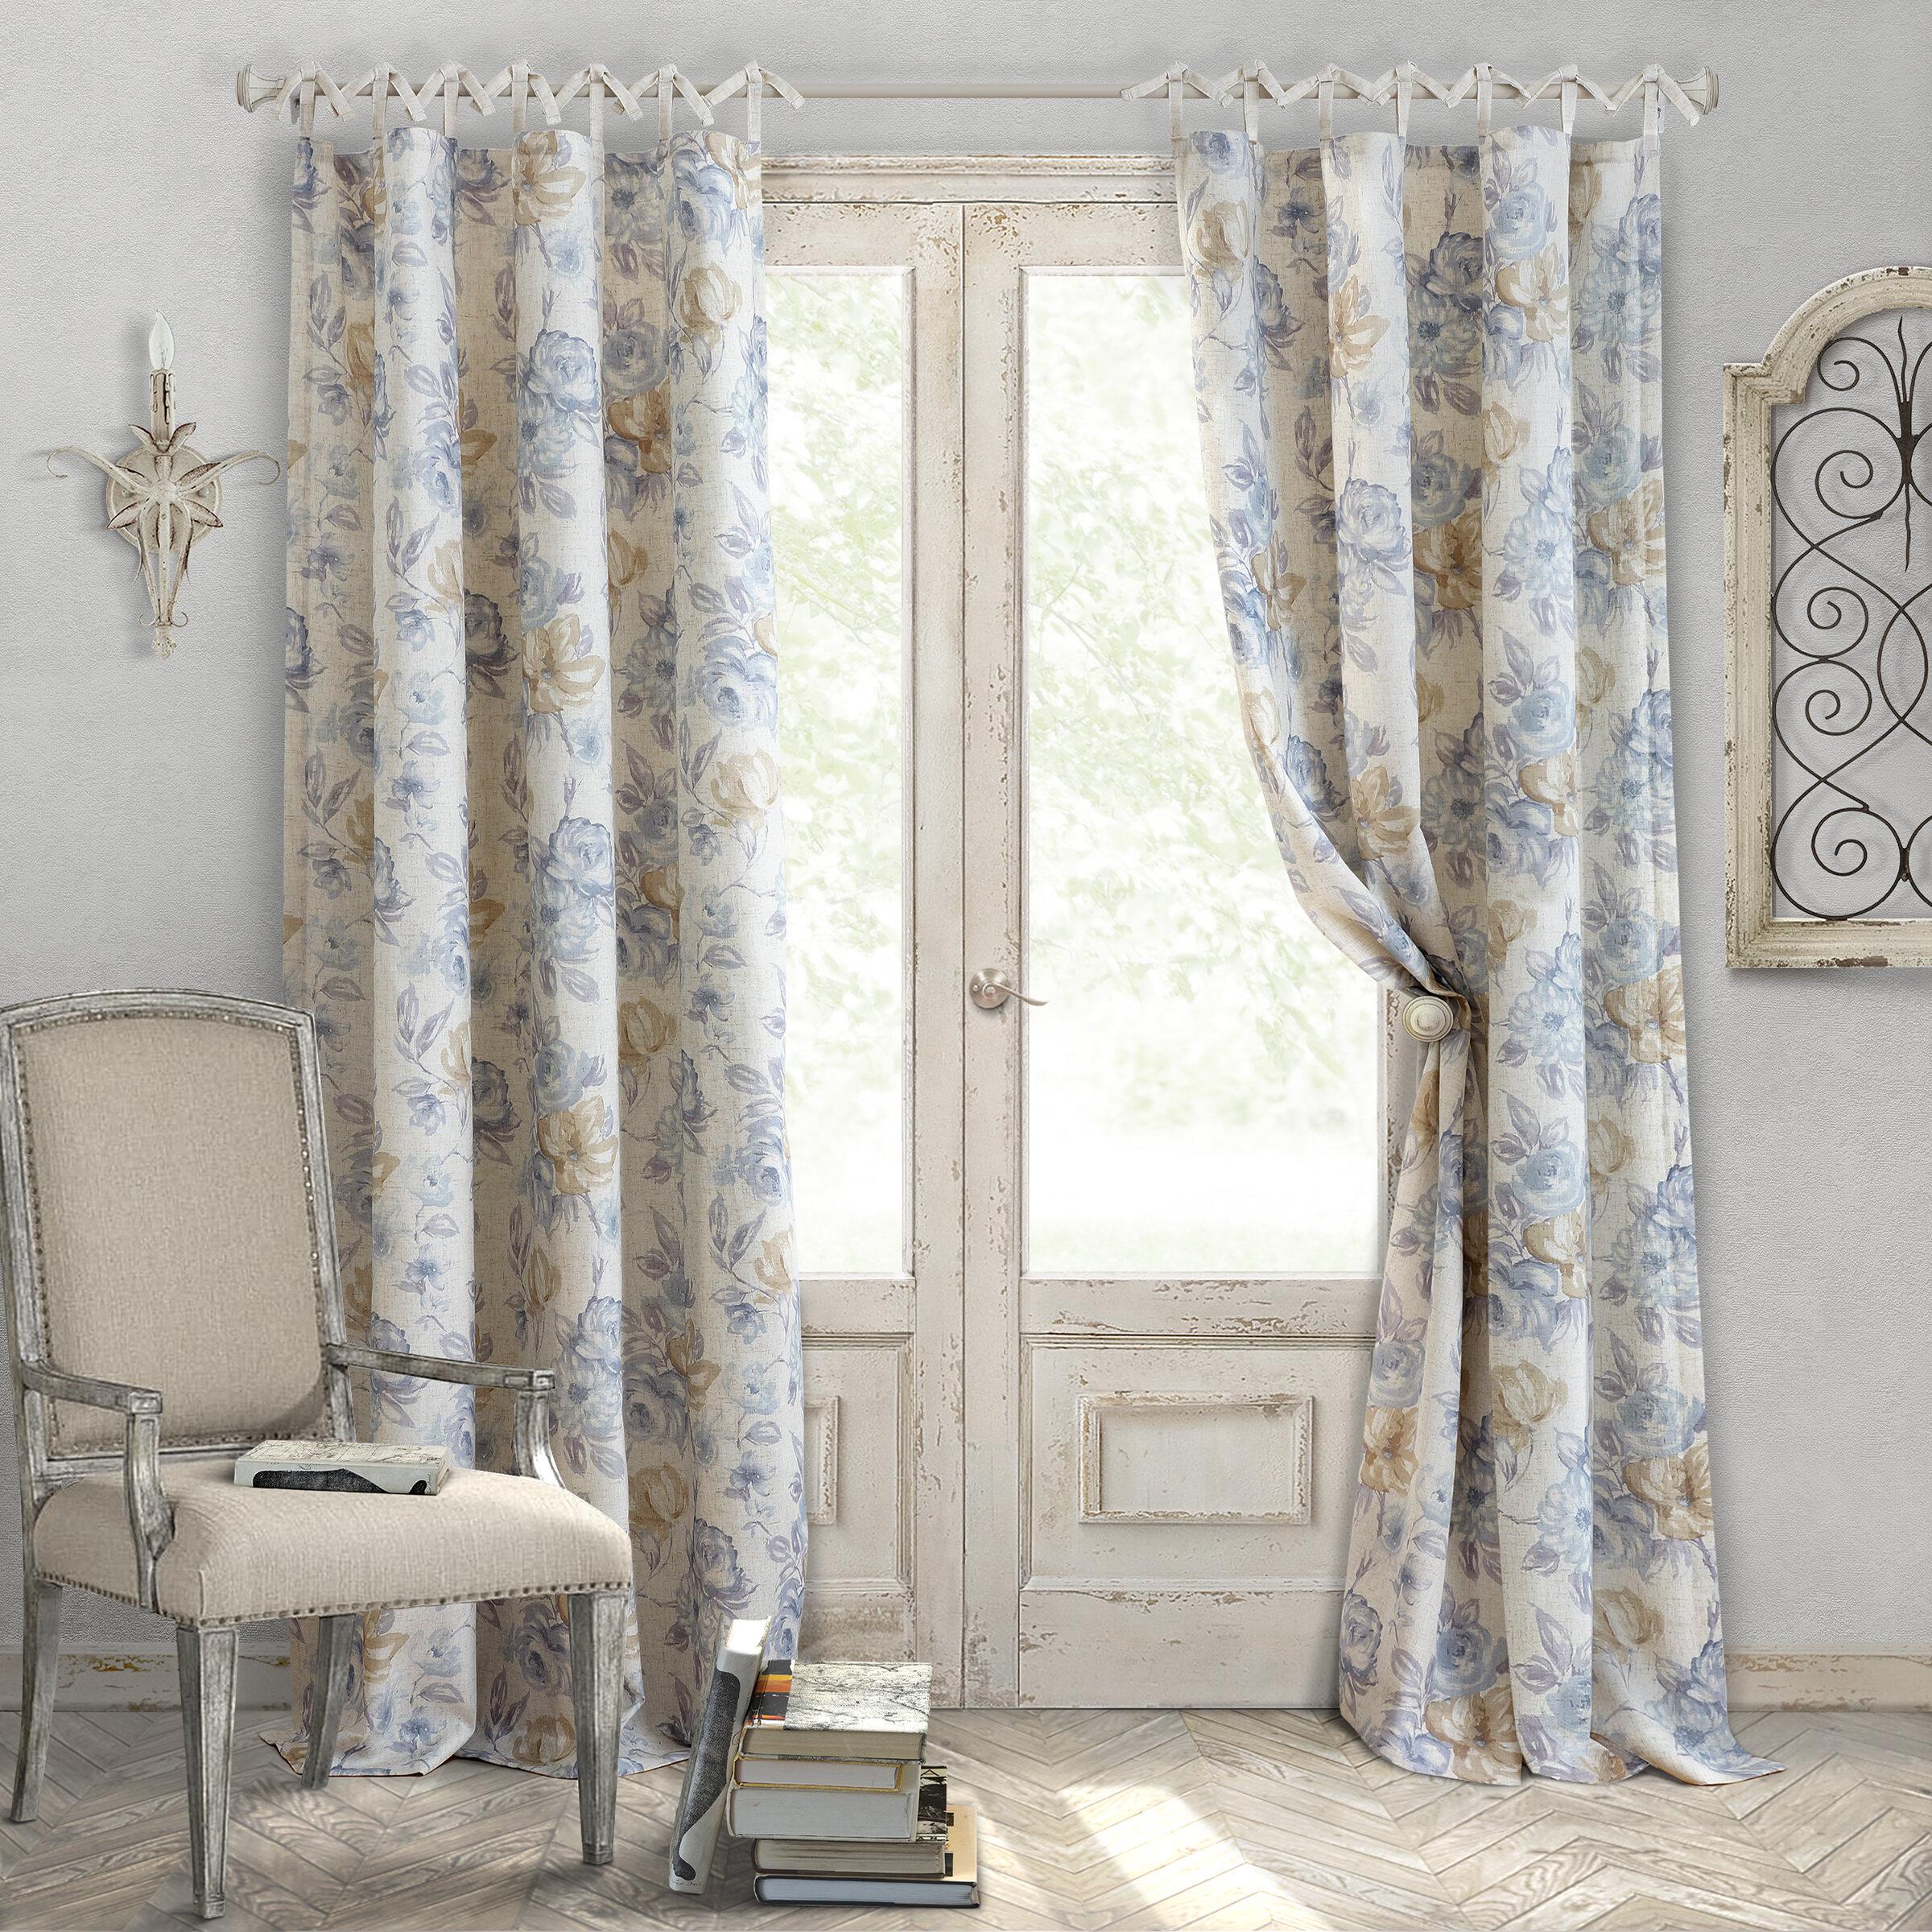 kitchen floral amazon home astoria curtain pair curtains panels greenland com window panel dp